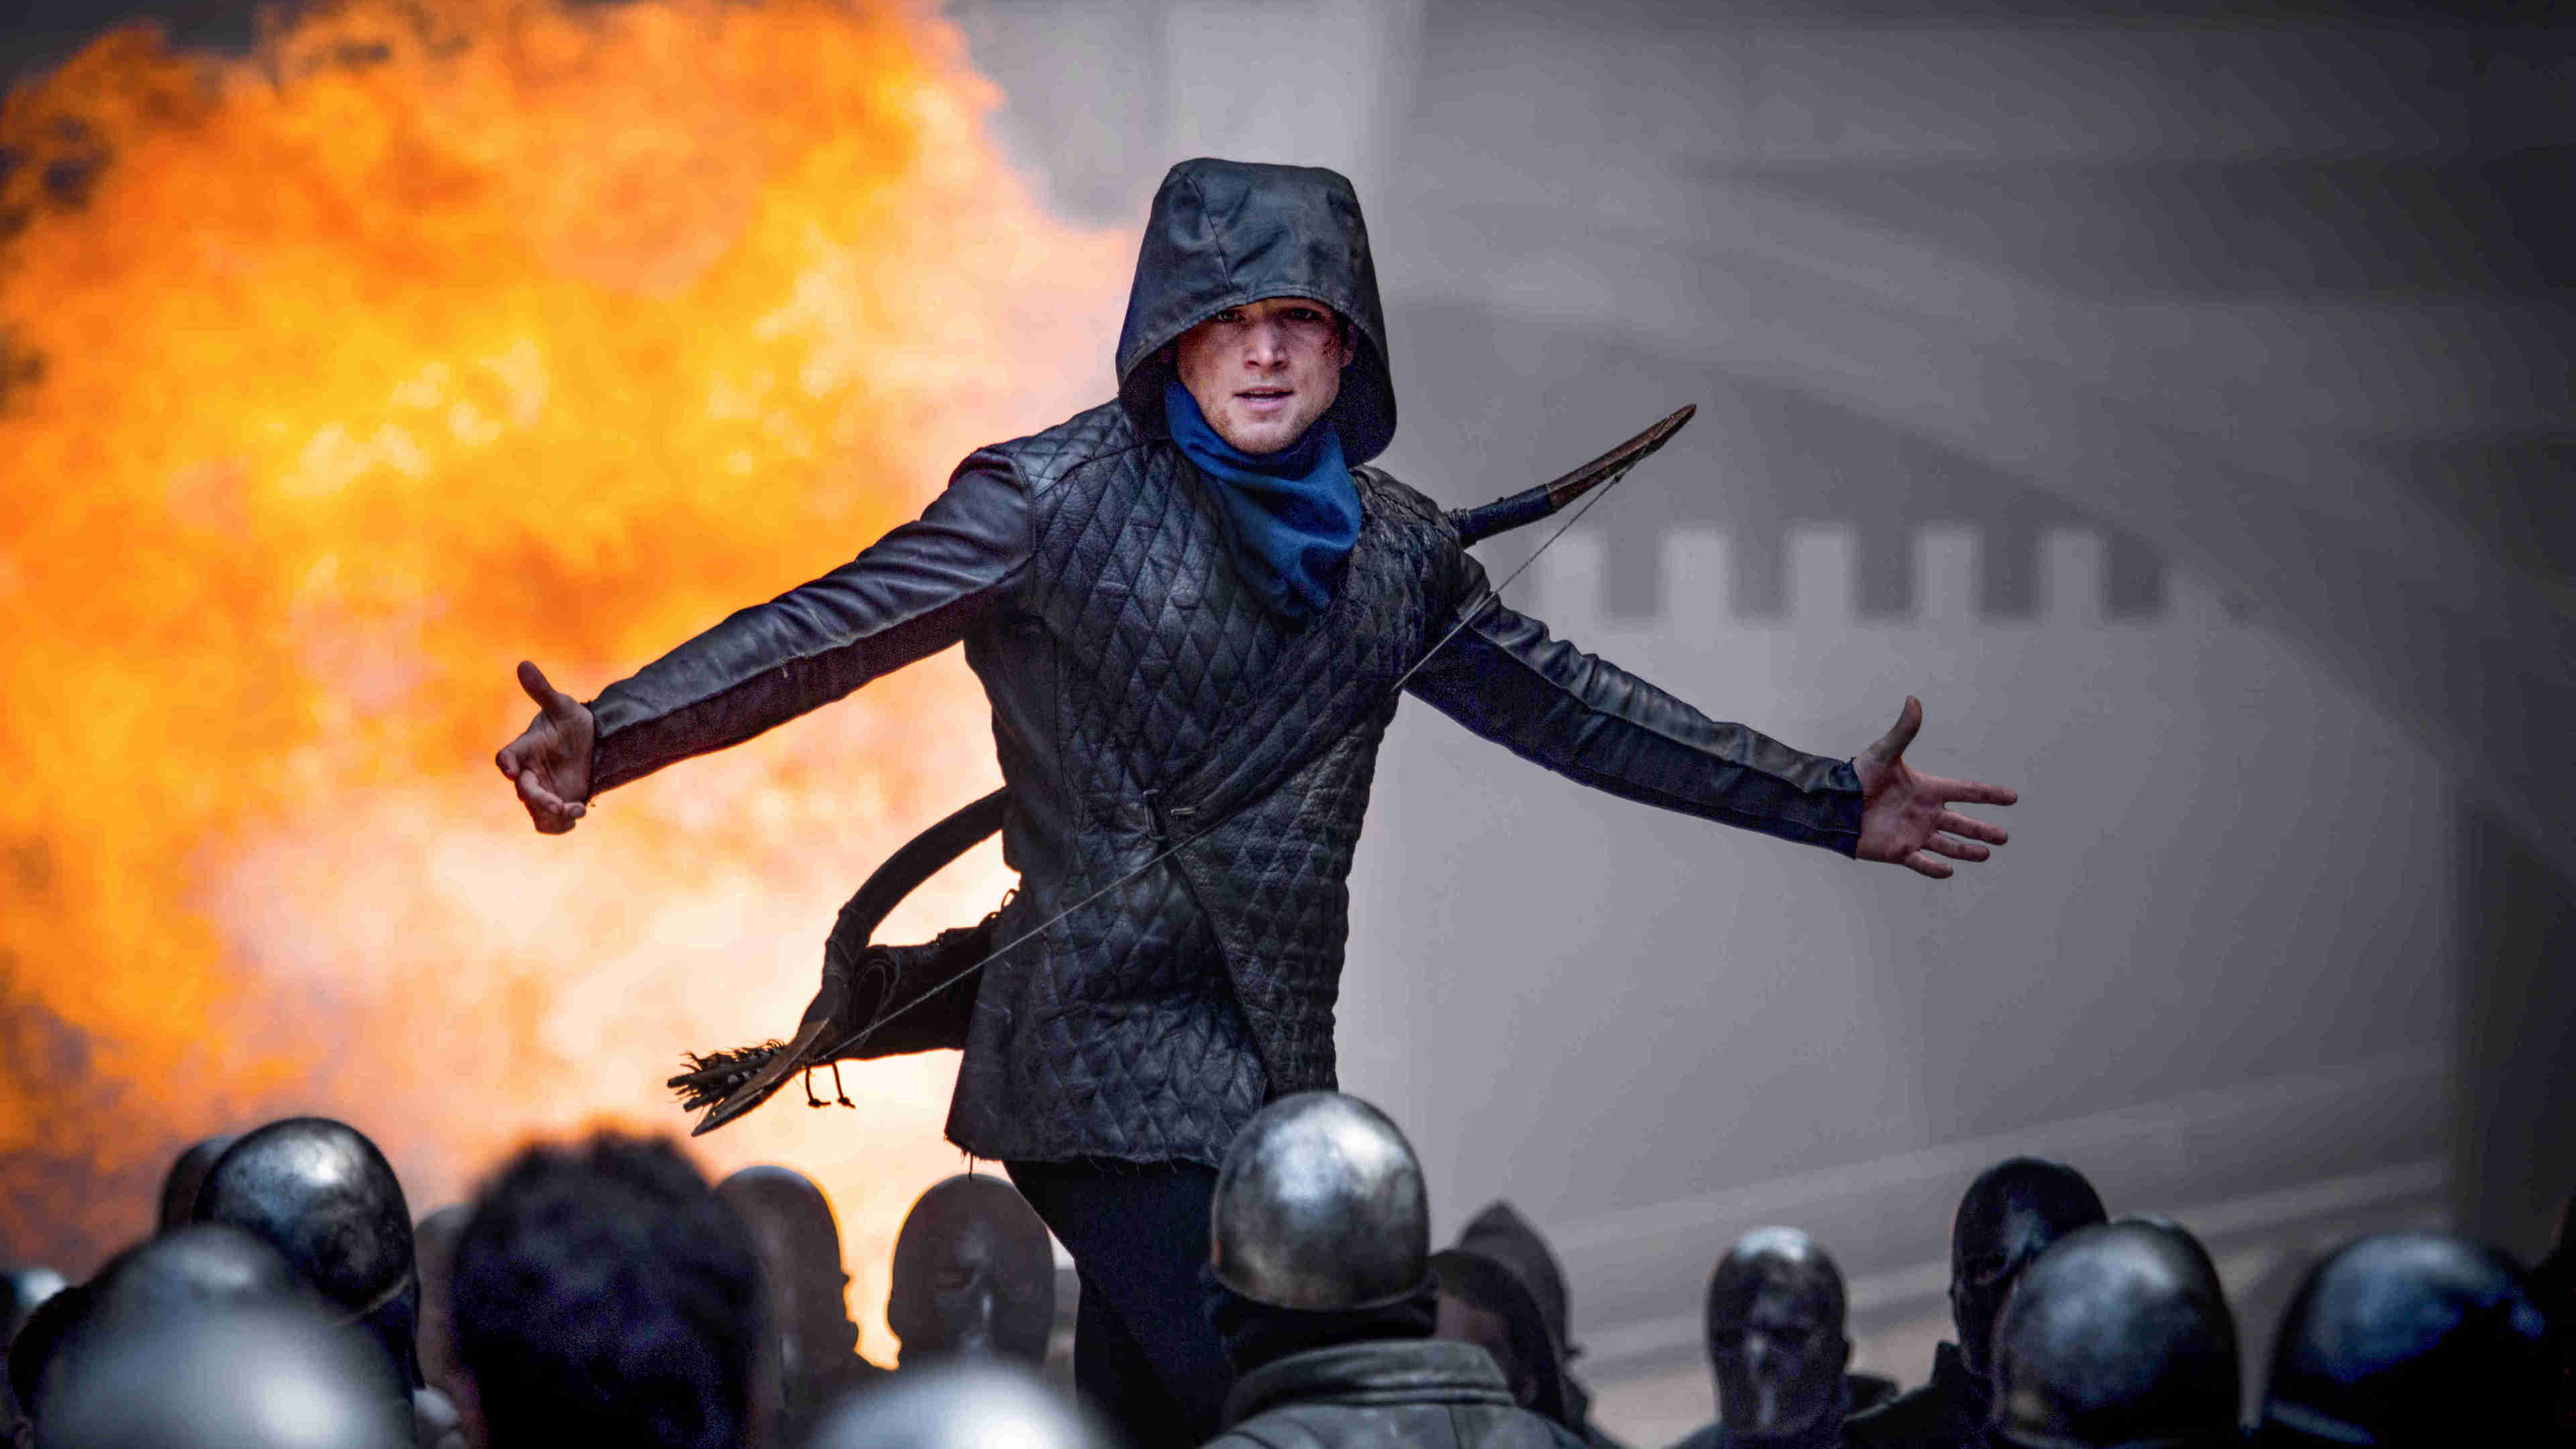 Wallpaper 4k Robin Hood Movie Taron Egerton 2018 Movies